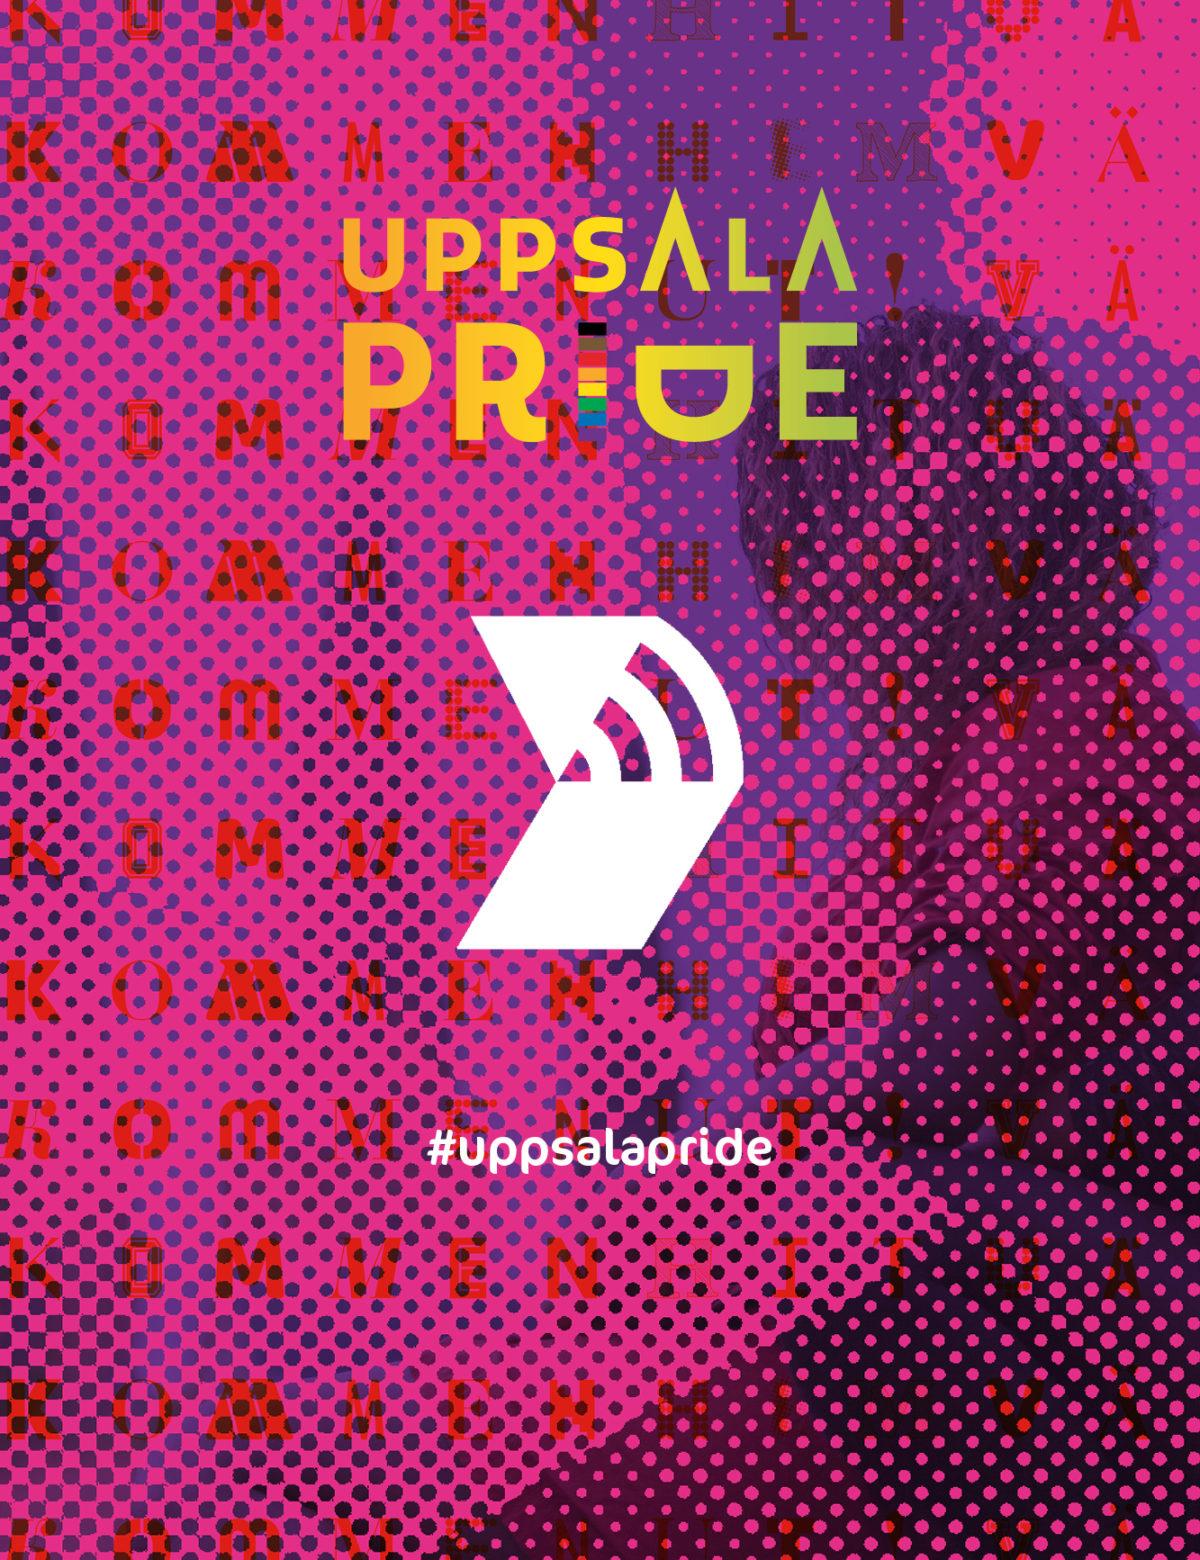 Uppsala Pride logo